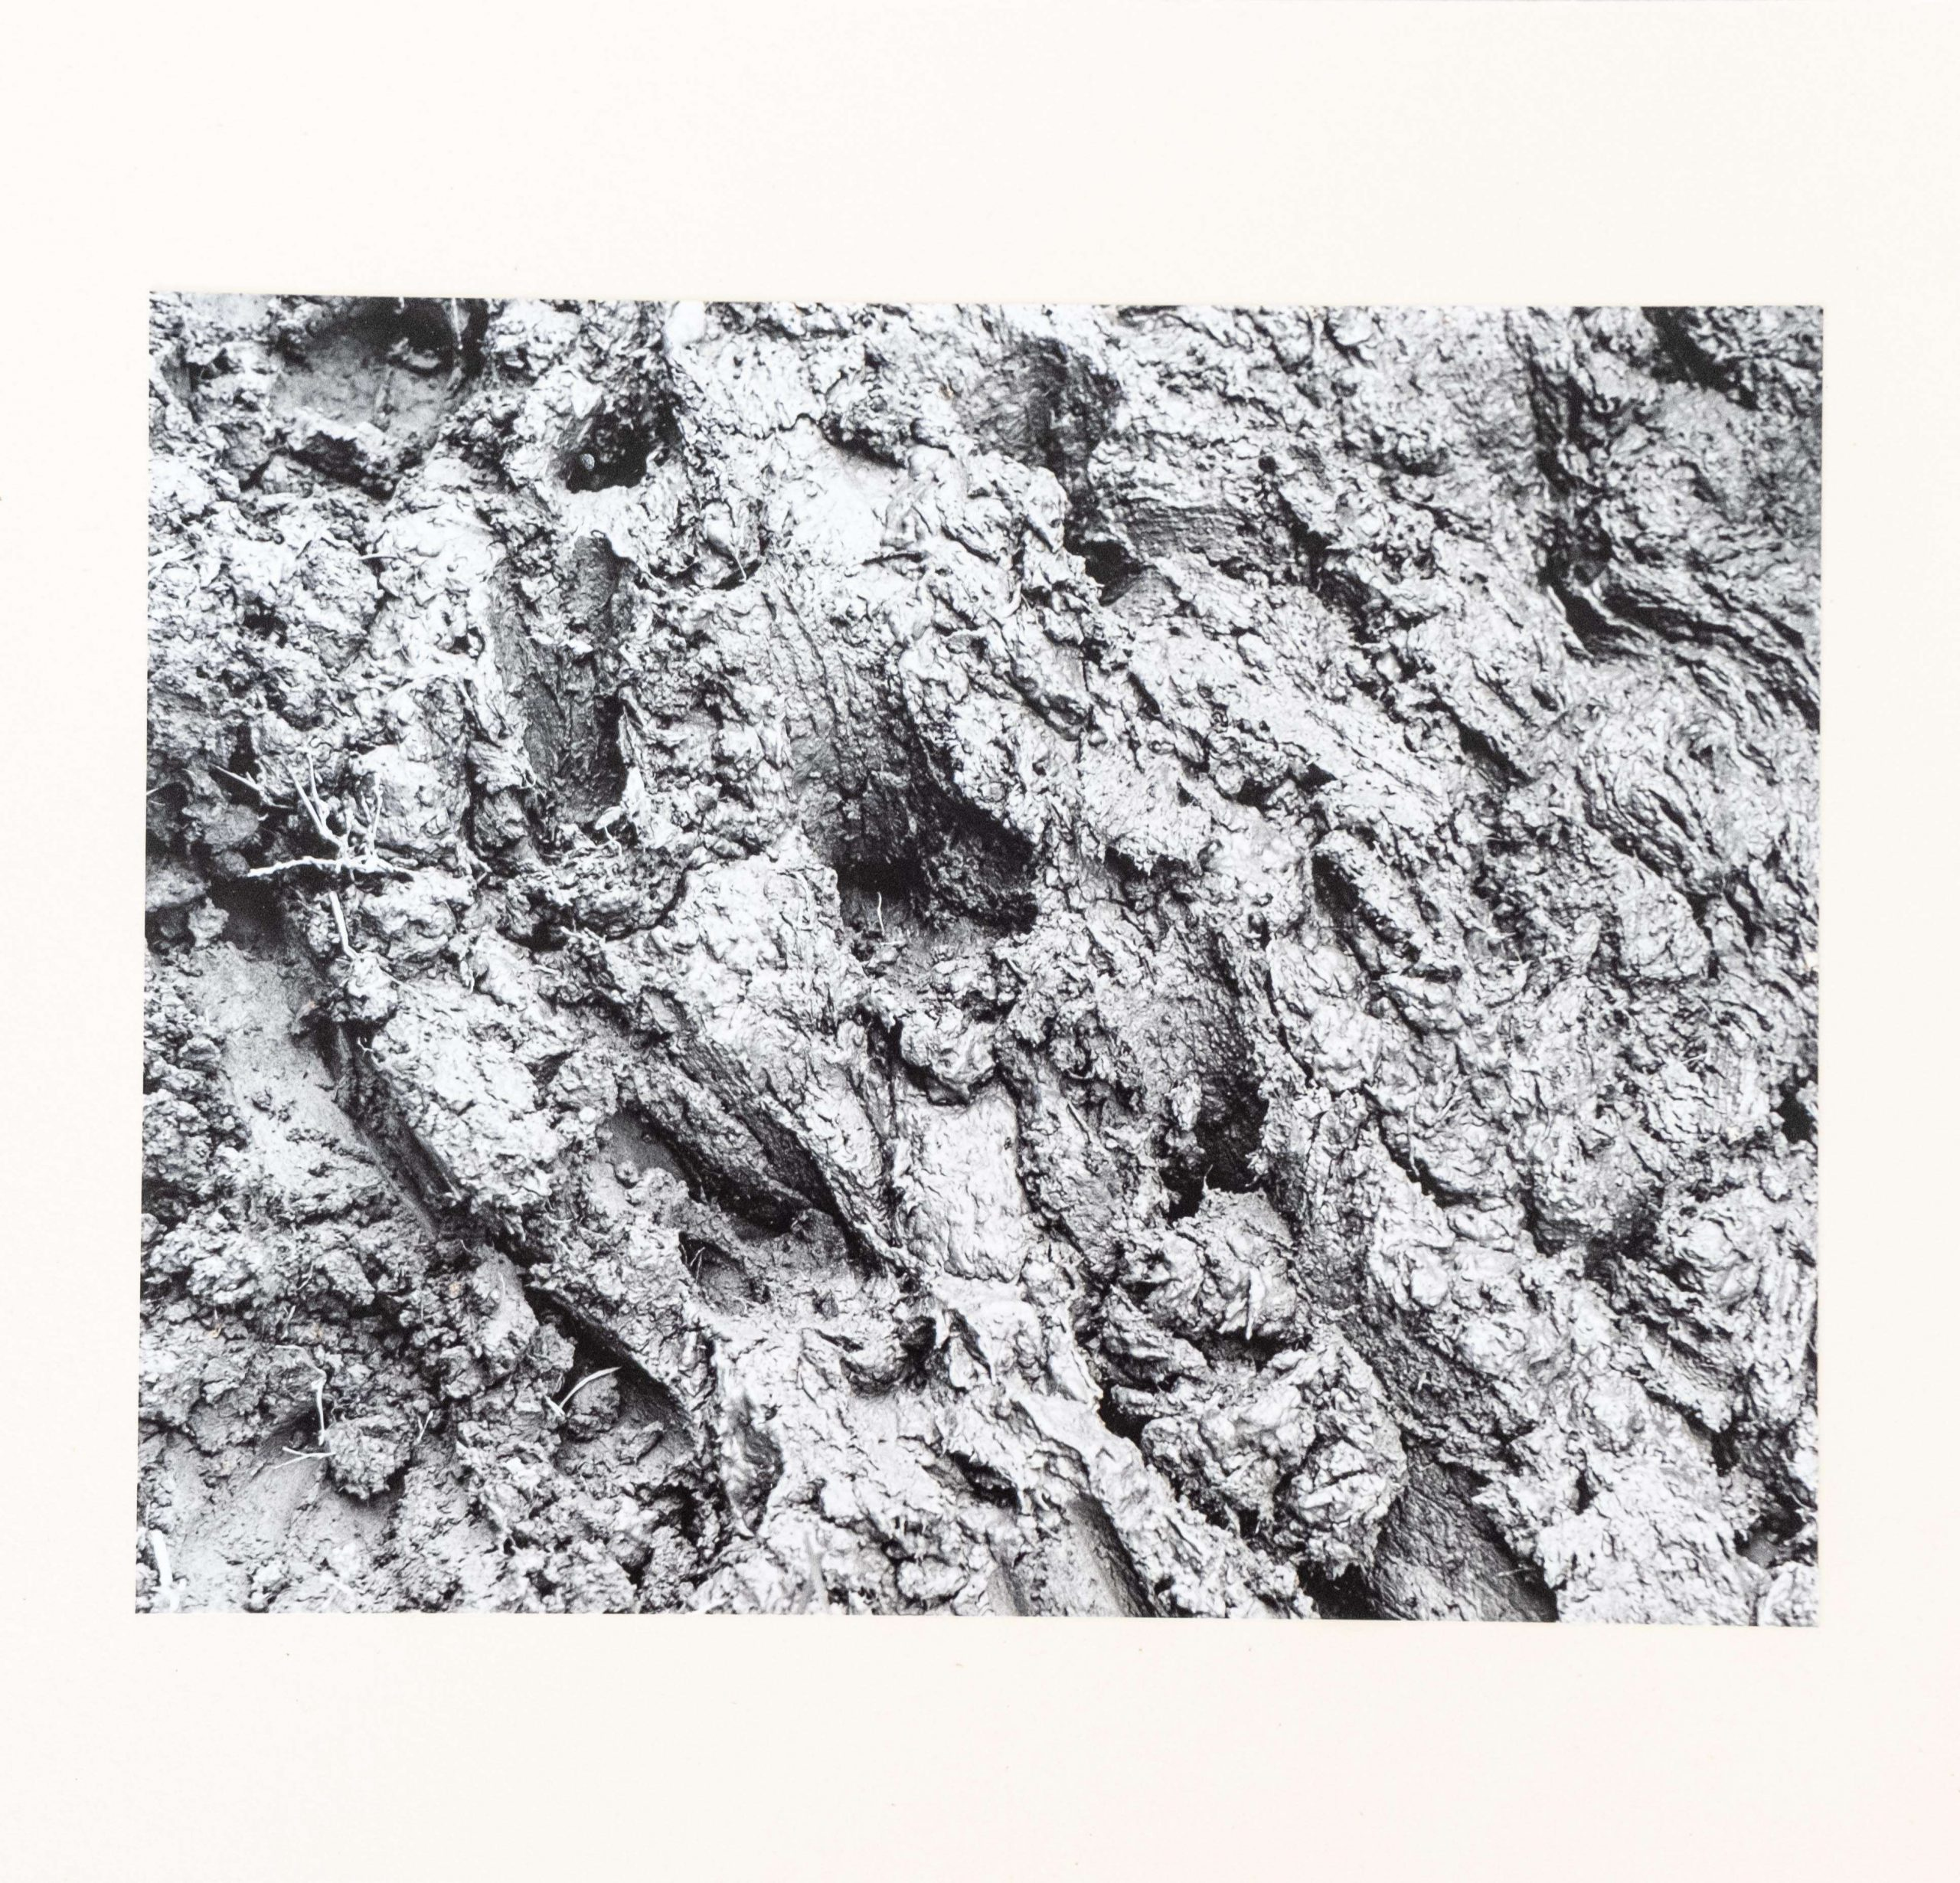 Silentes Loquimur fango